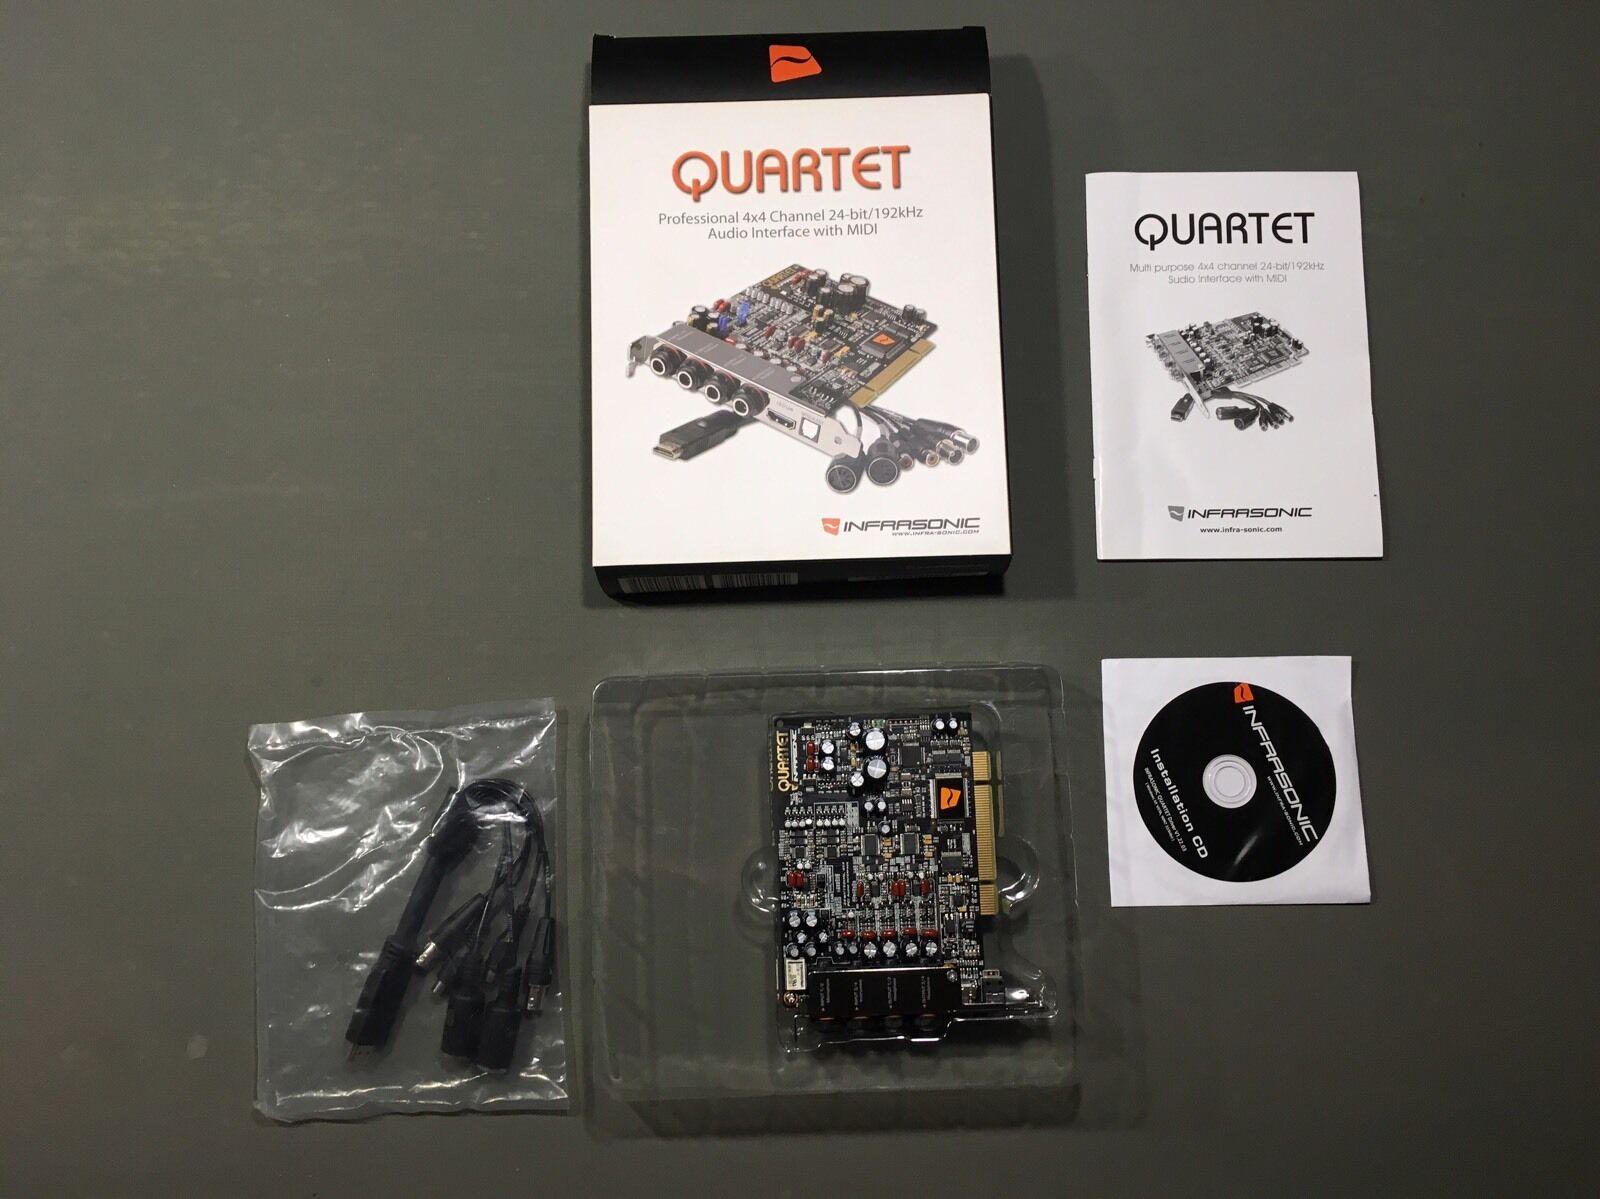 Quartet professional 4x4 channel 24 bit 192khz audio interface with midi